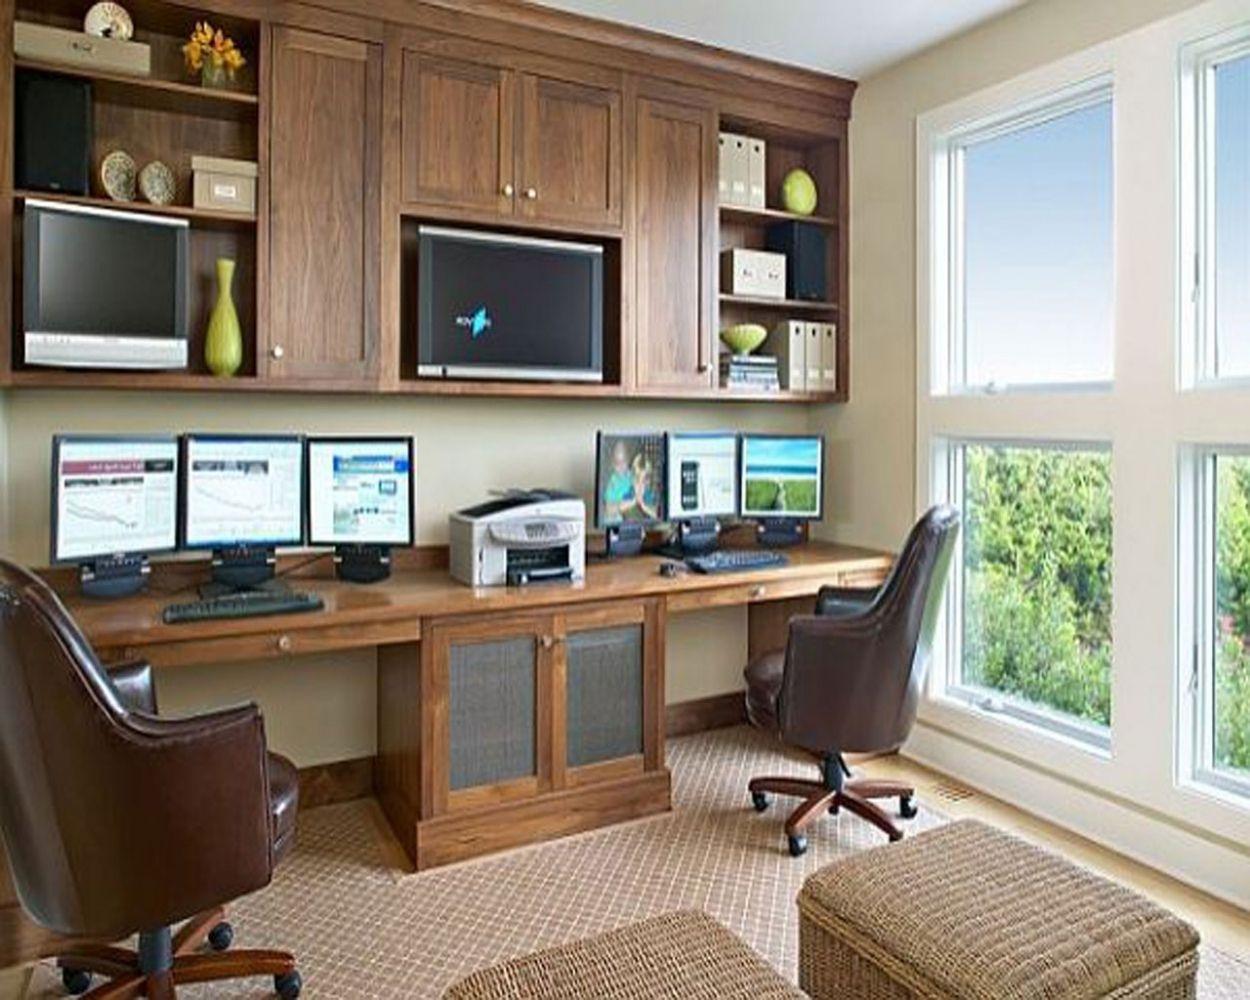 office furniture arrangement. Home Office Furniture Arrangement Ideas - Best Check More At Http:/ A